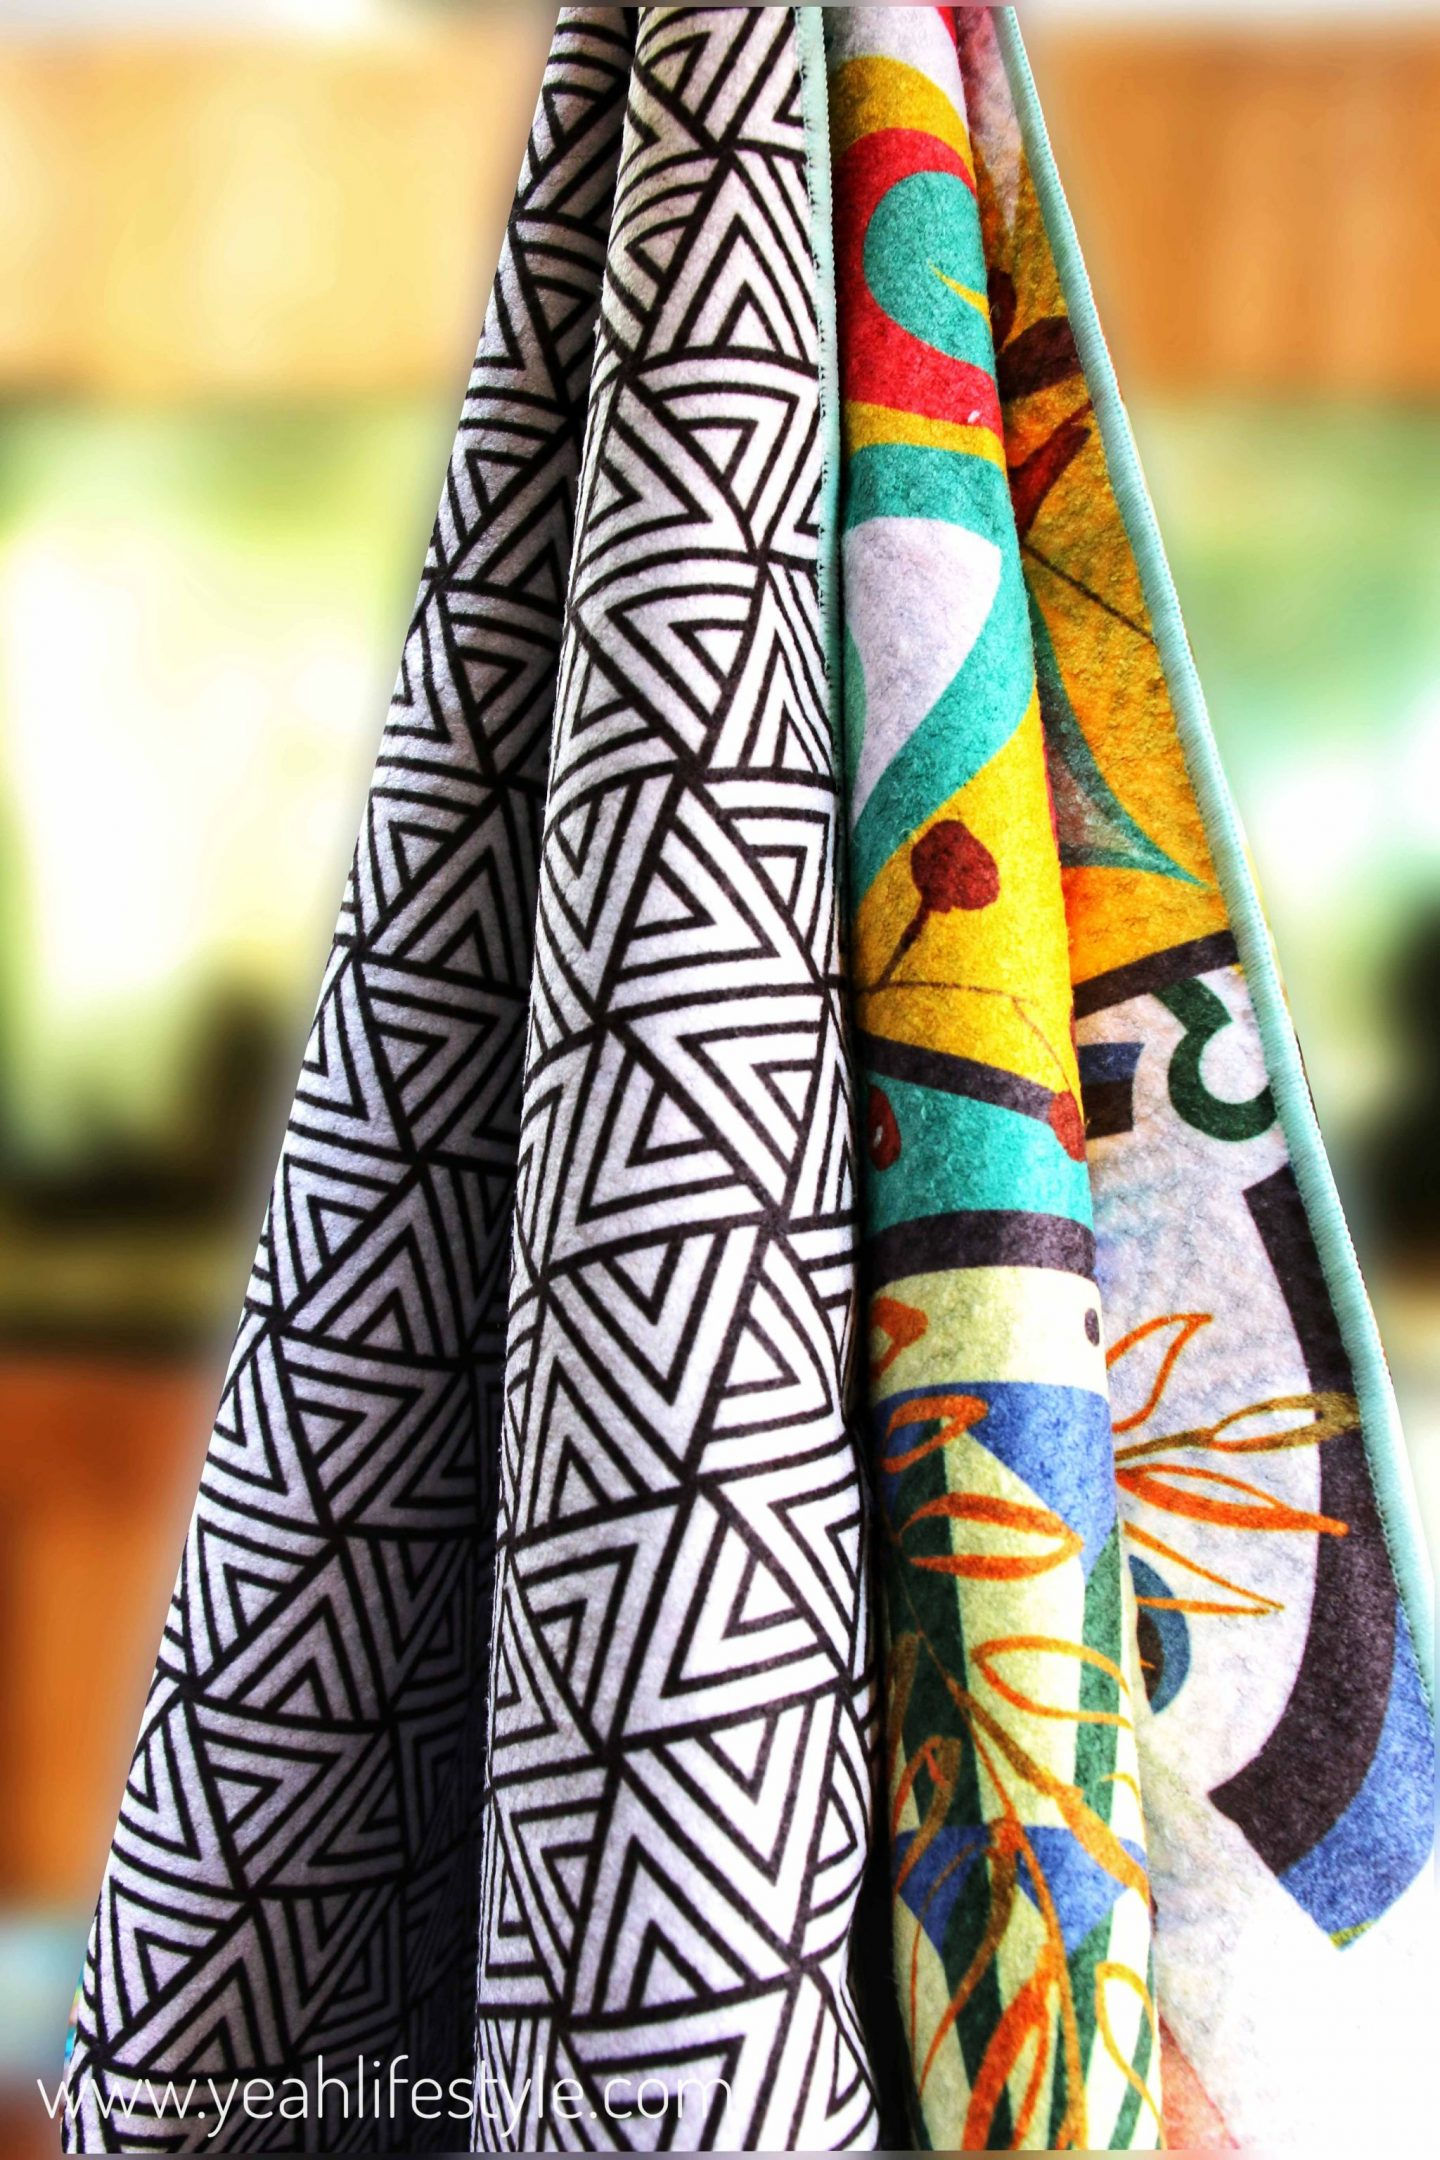 October-Gift-Guide-Review-Tesalate-Towel-Australia